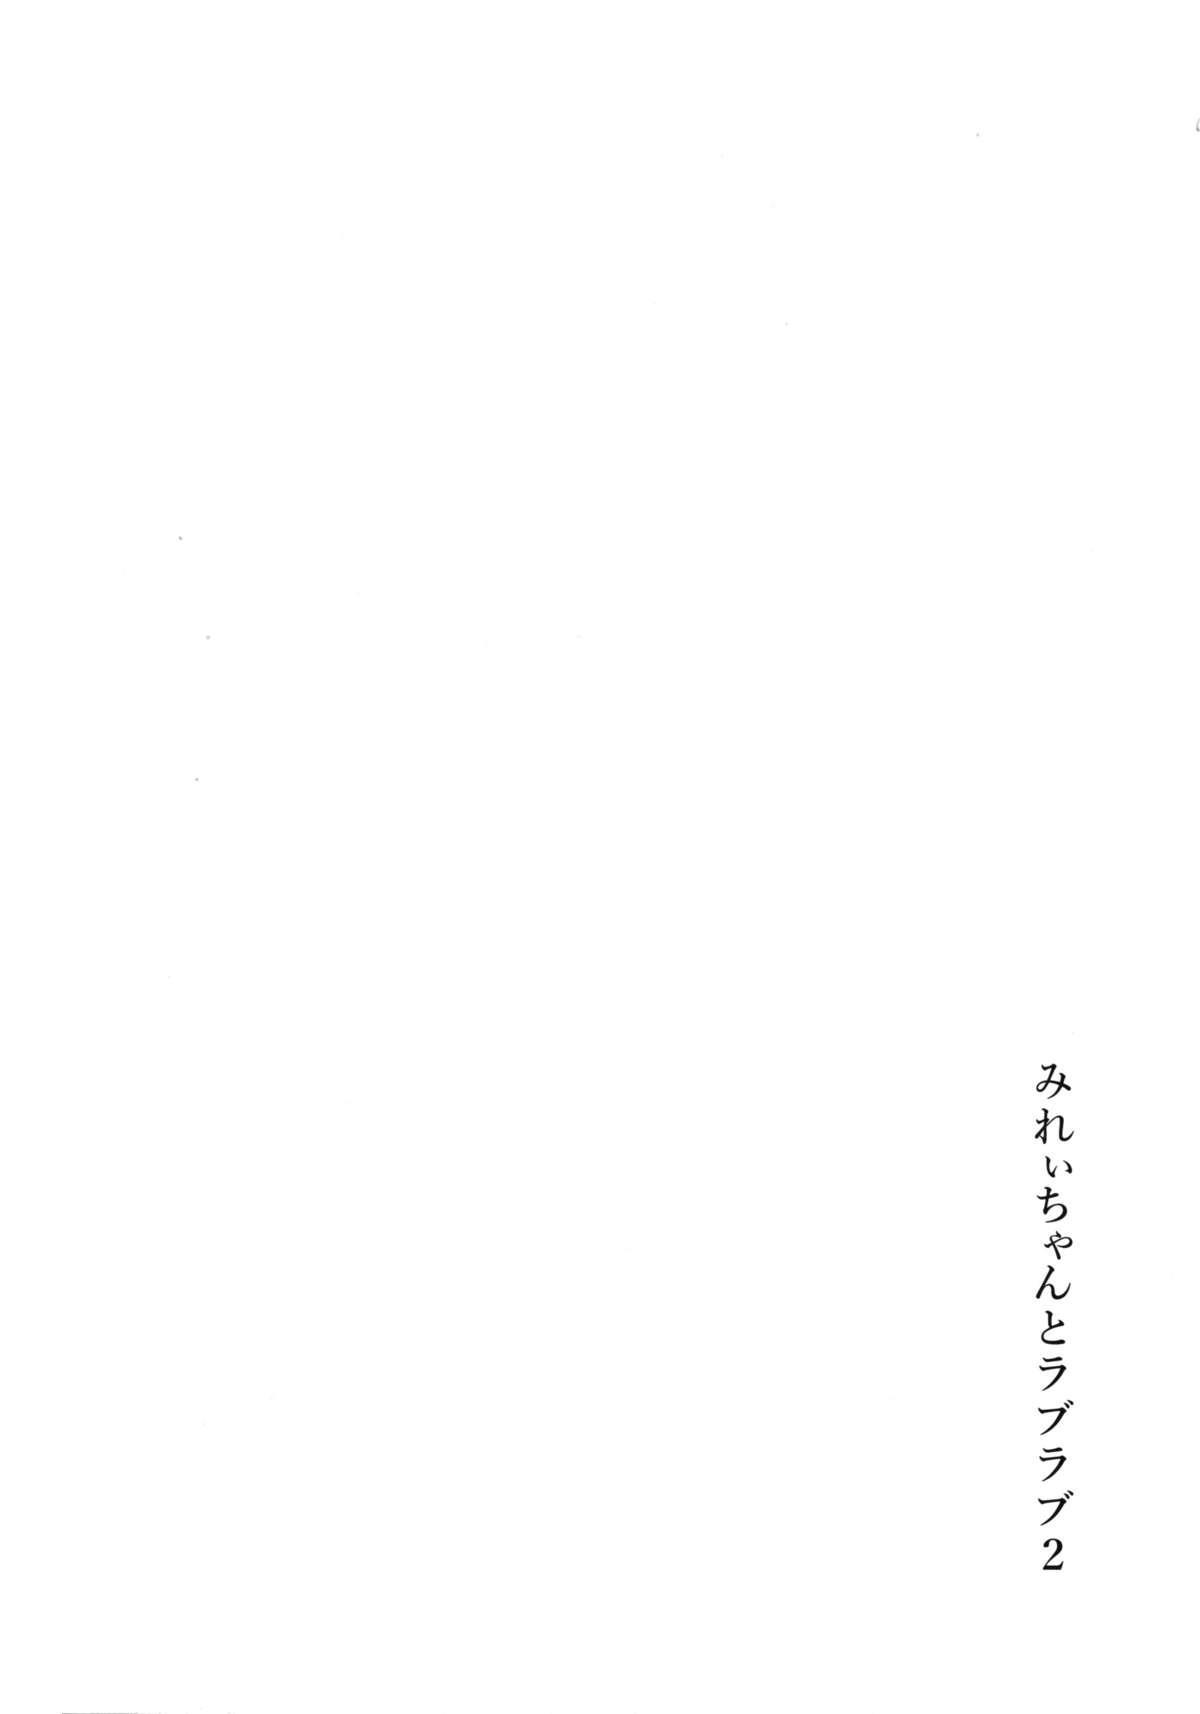 Mirei-chan to Love Love 2 2